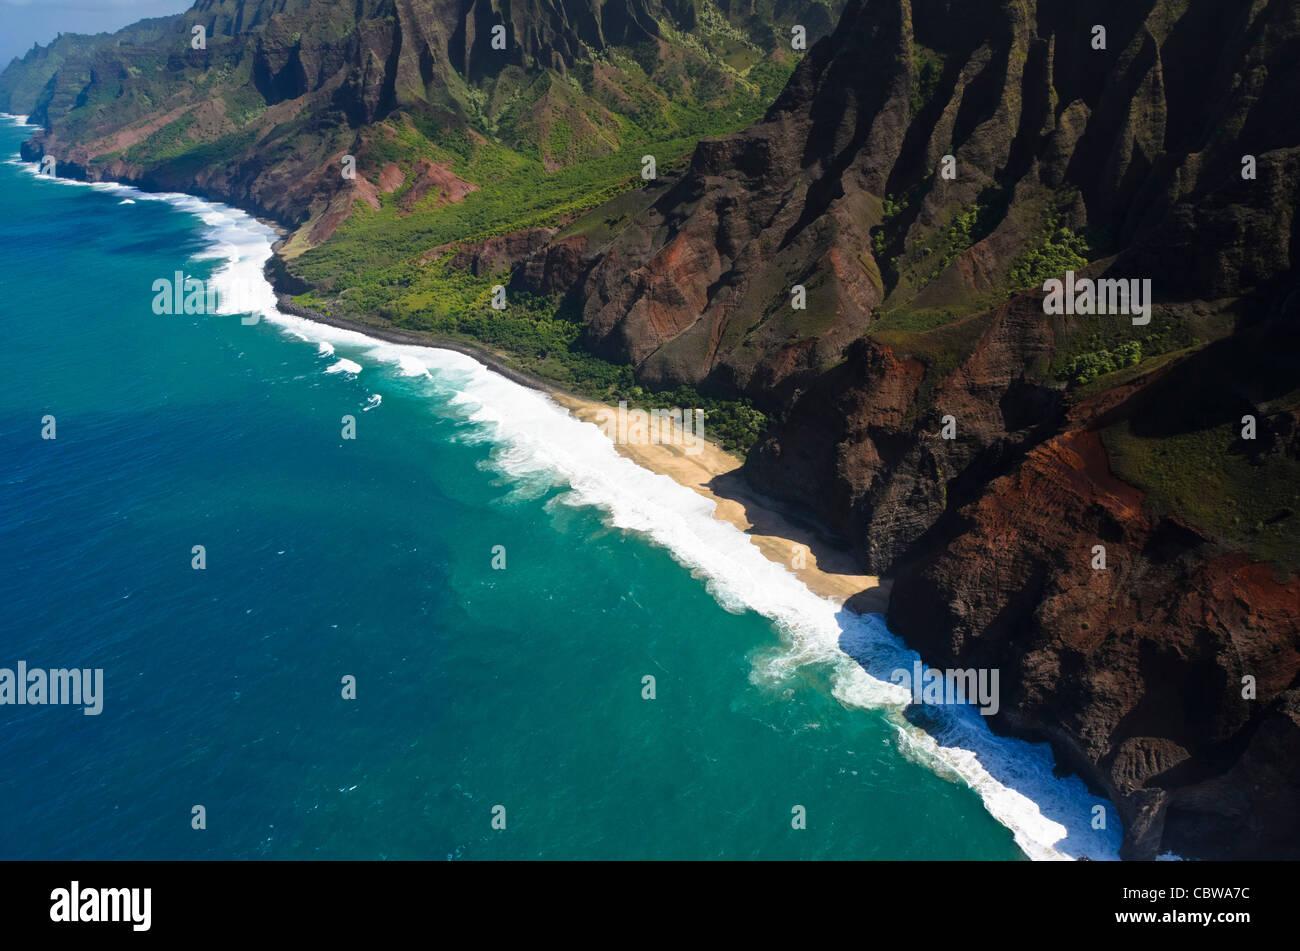 Die Na Pali Coast vom Himmel Insel Kauai, Hawaii, USA Stockbild